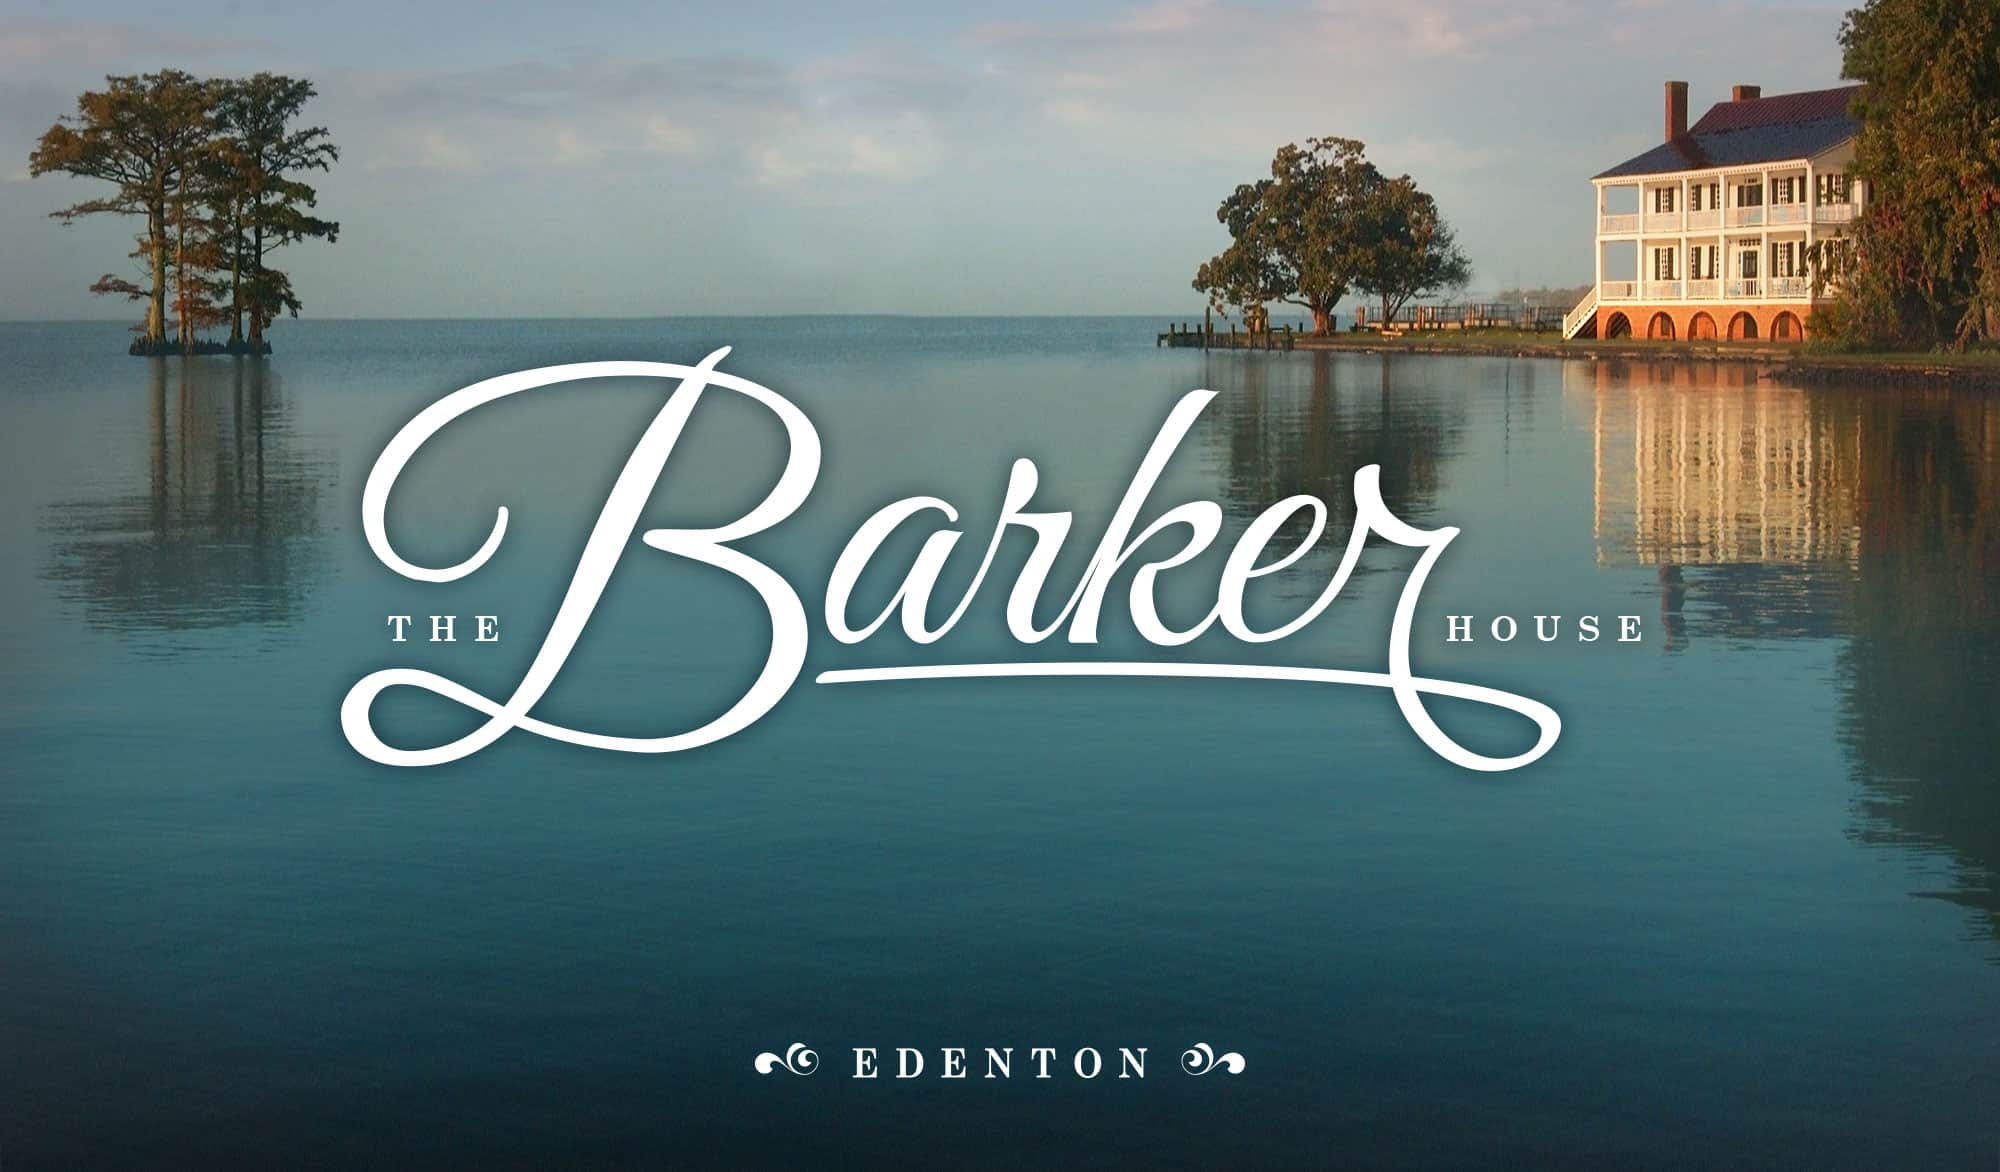 Barkerhouse